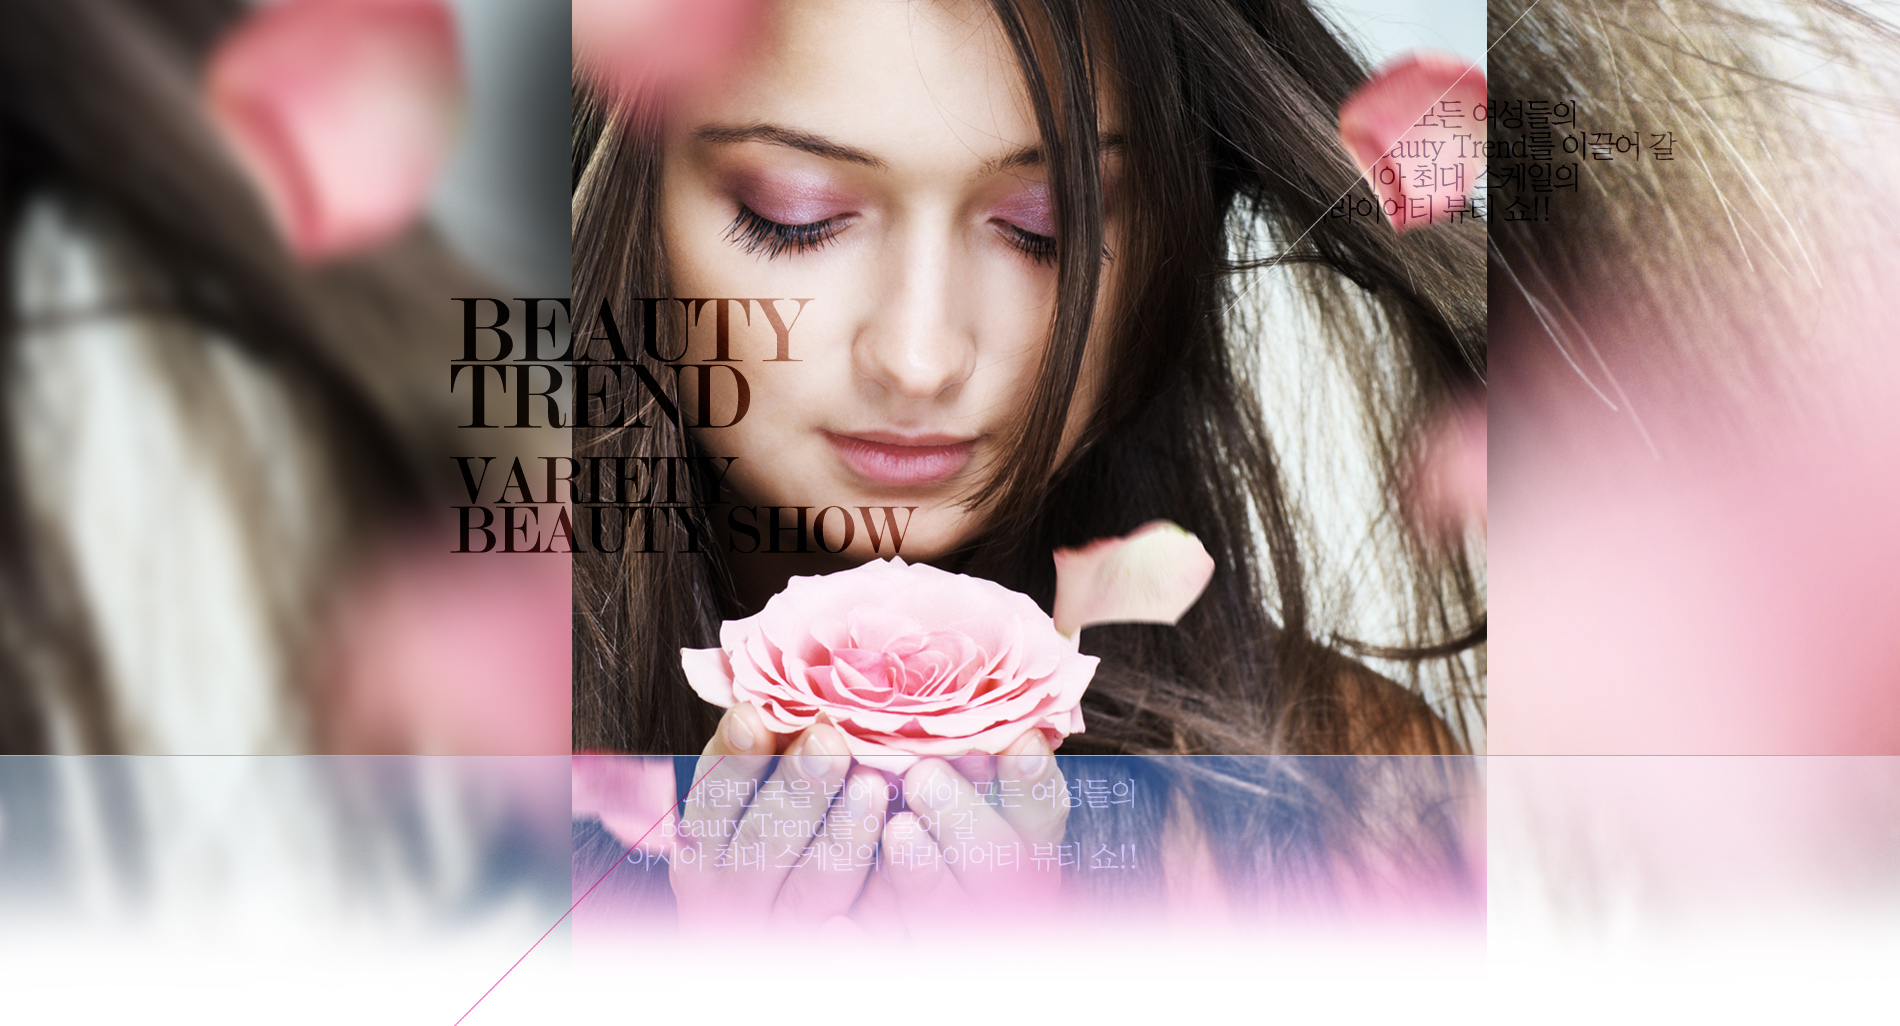 star beauty mc,beauty expert i'm beautist event